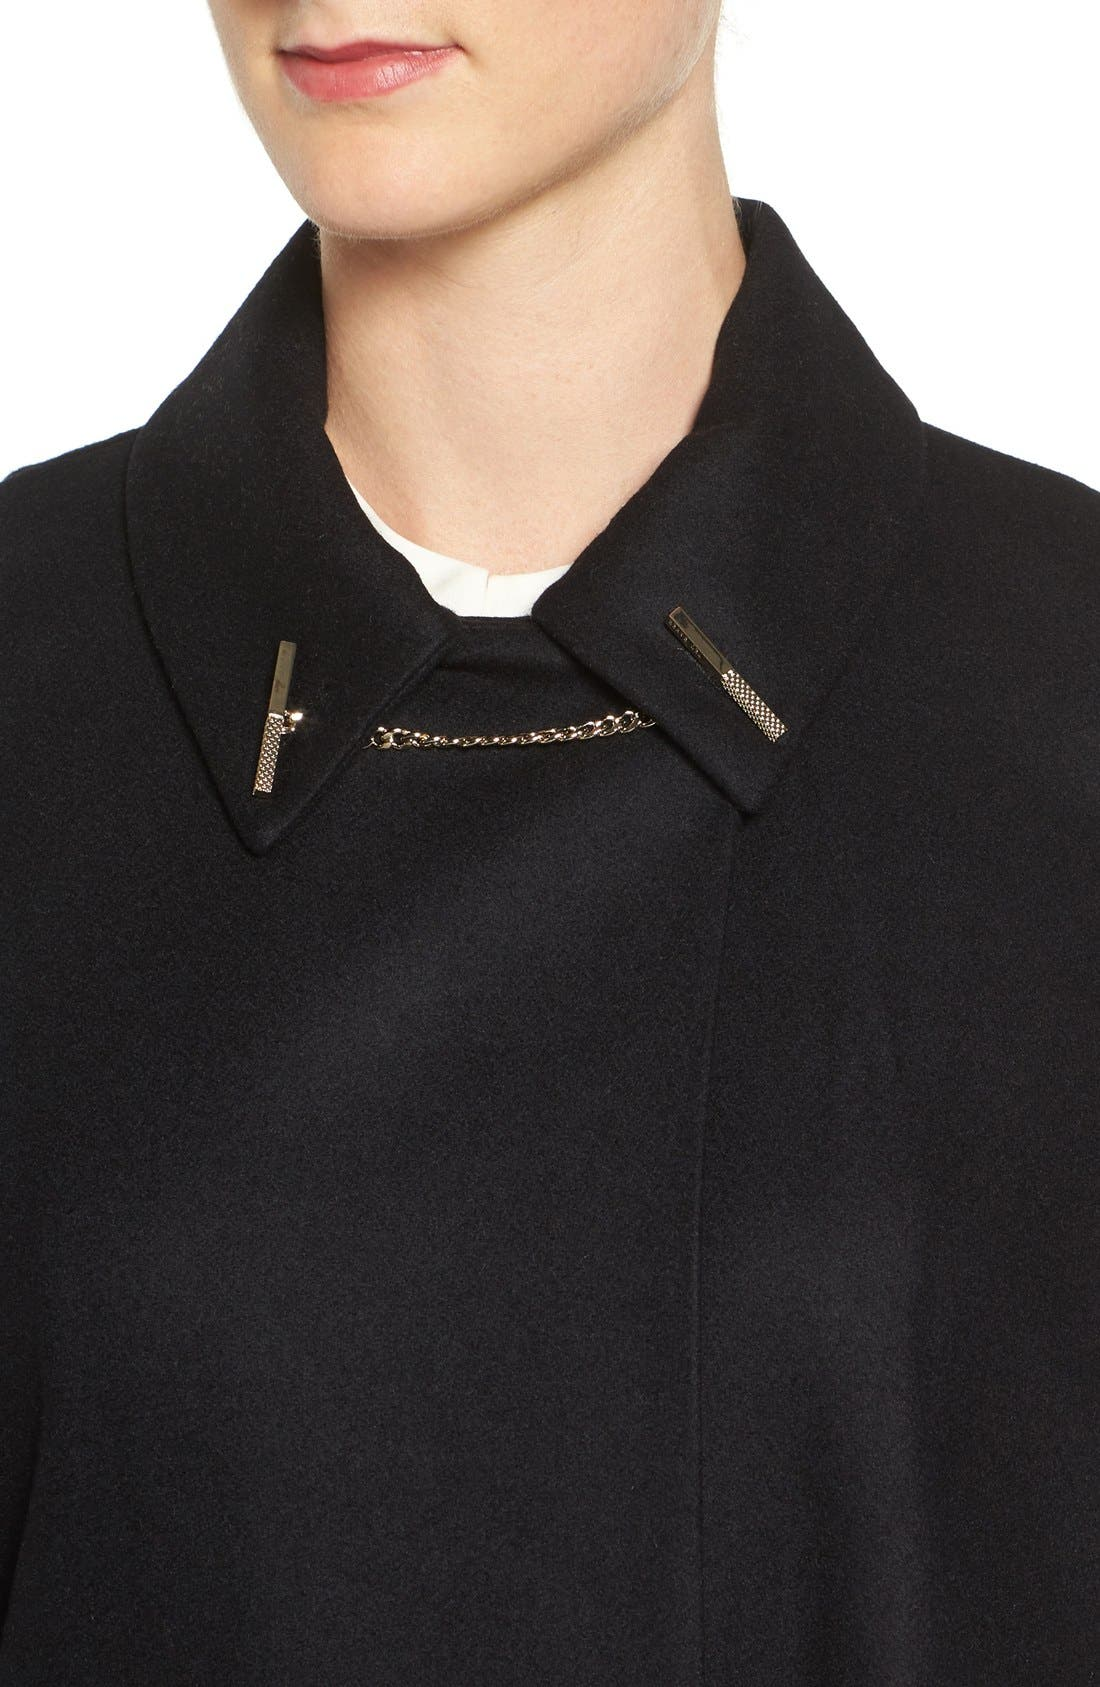 Leisl Chain Collar Cape,                             Alternate thumbnail 4, color,                             001